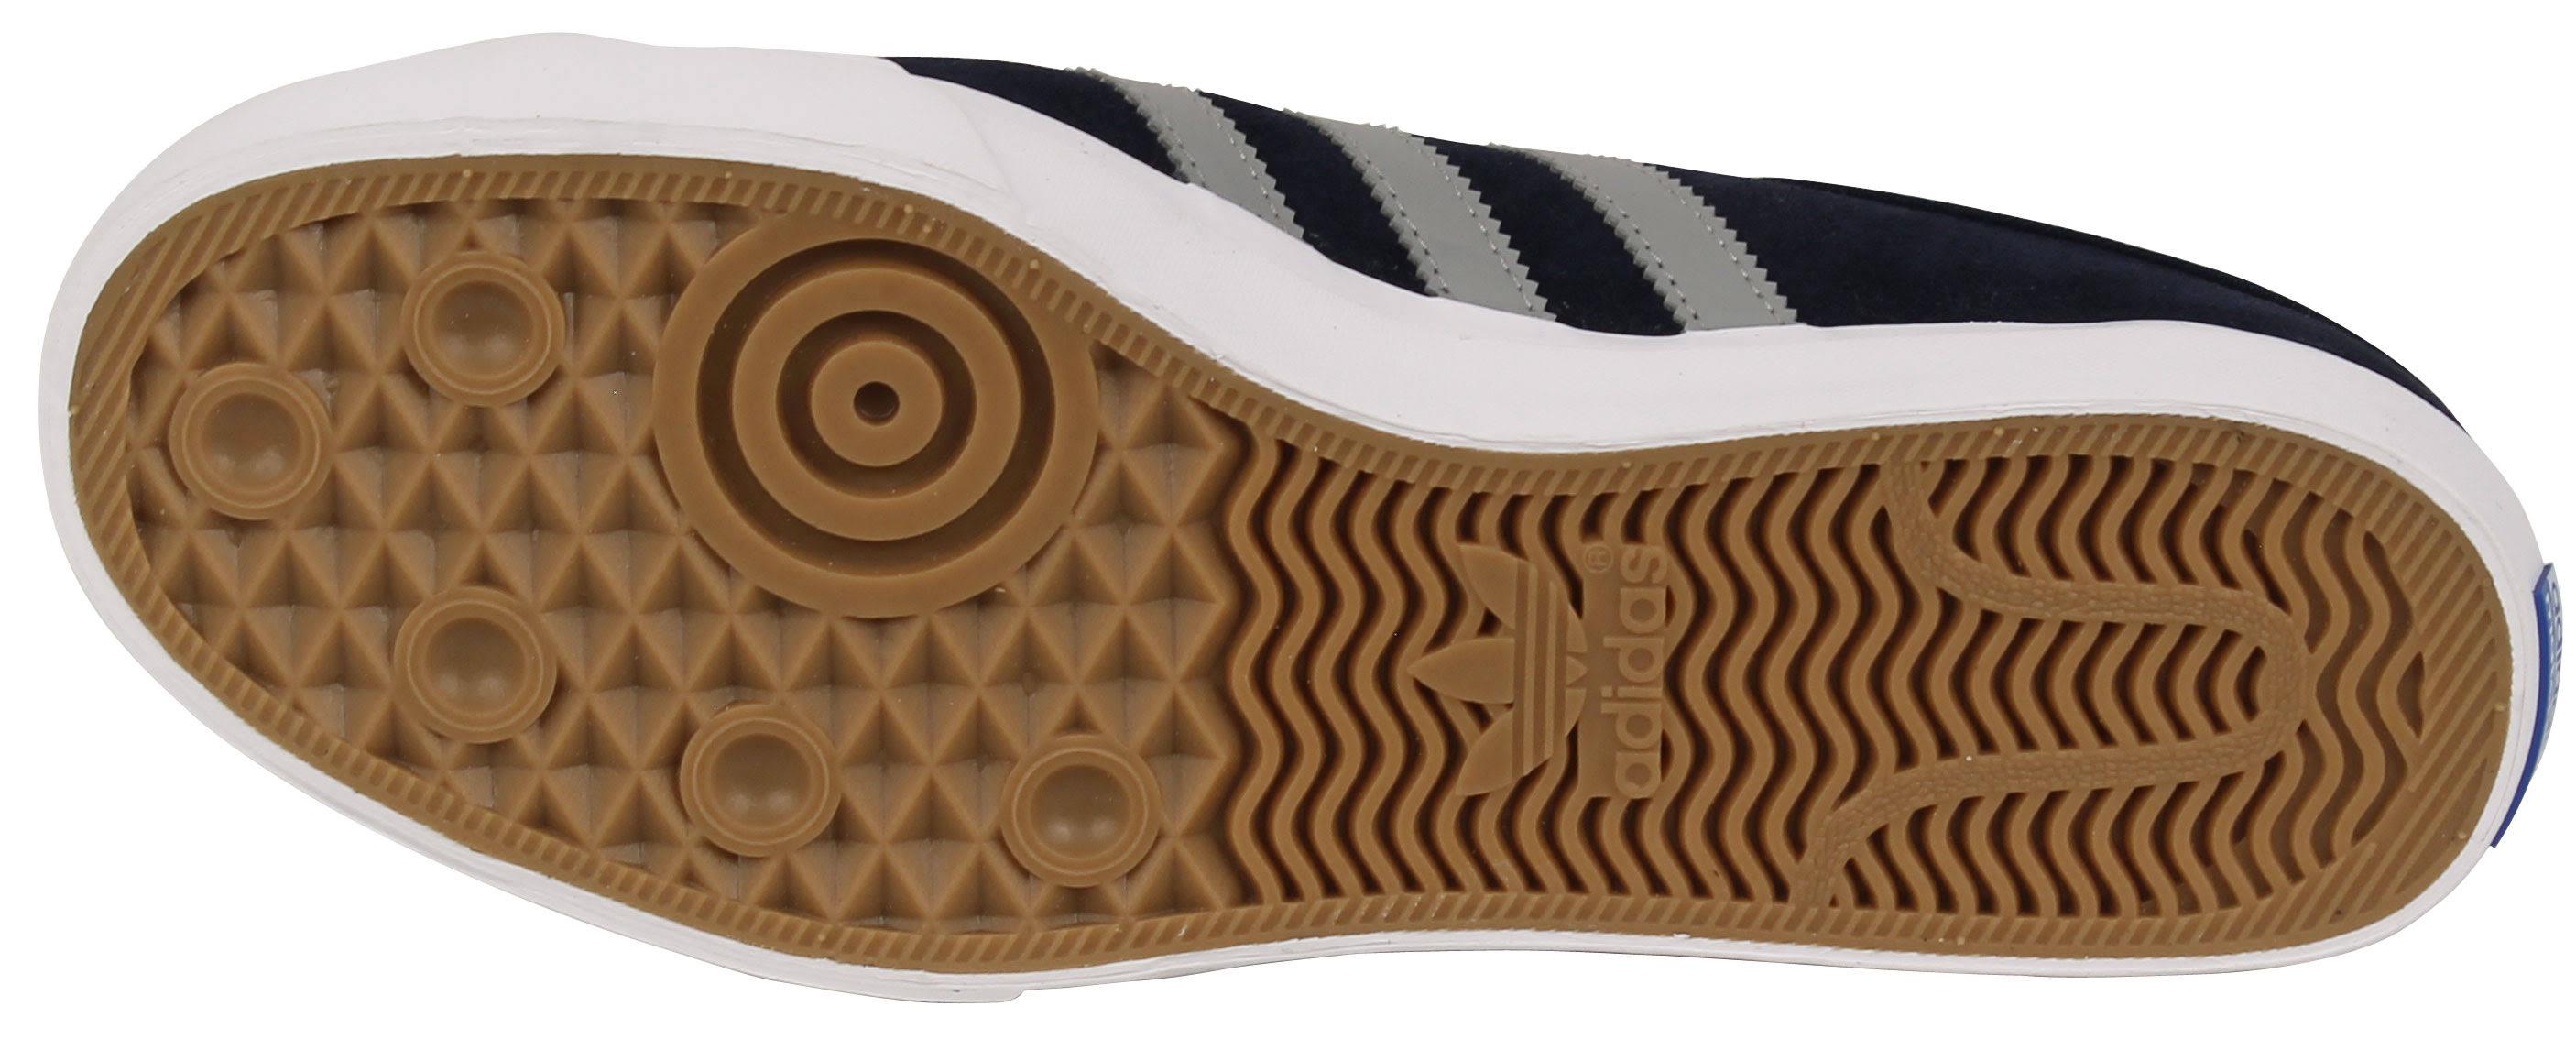 10 Blue Adidas Skate Shoe Men's Matchcourt 88Fq71